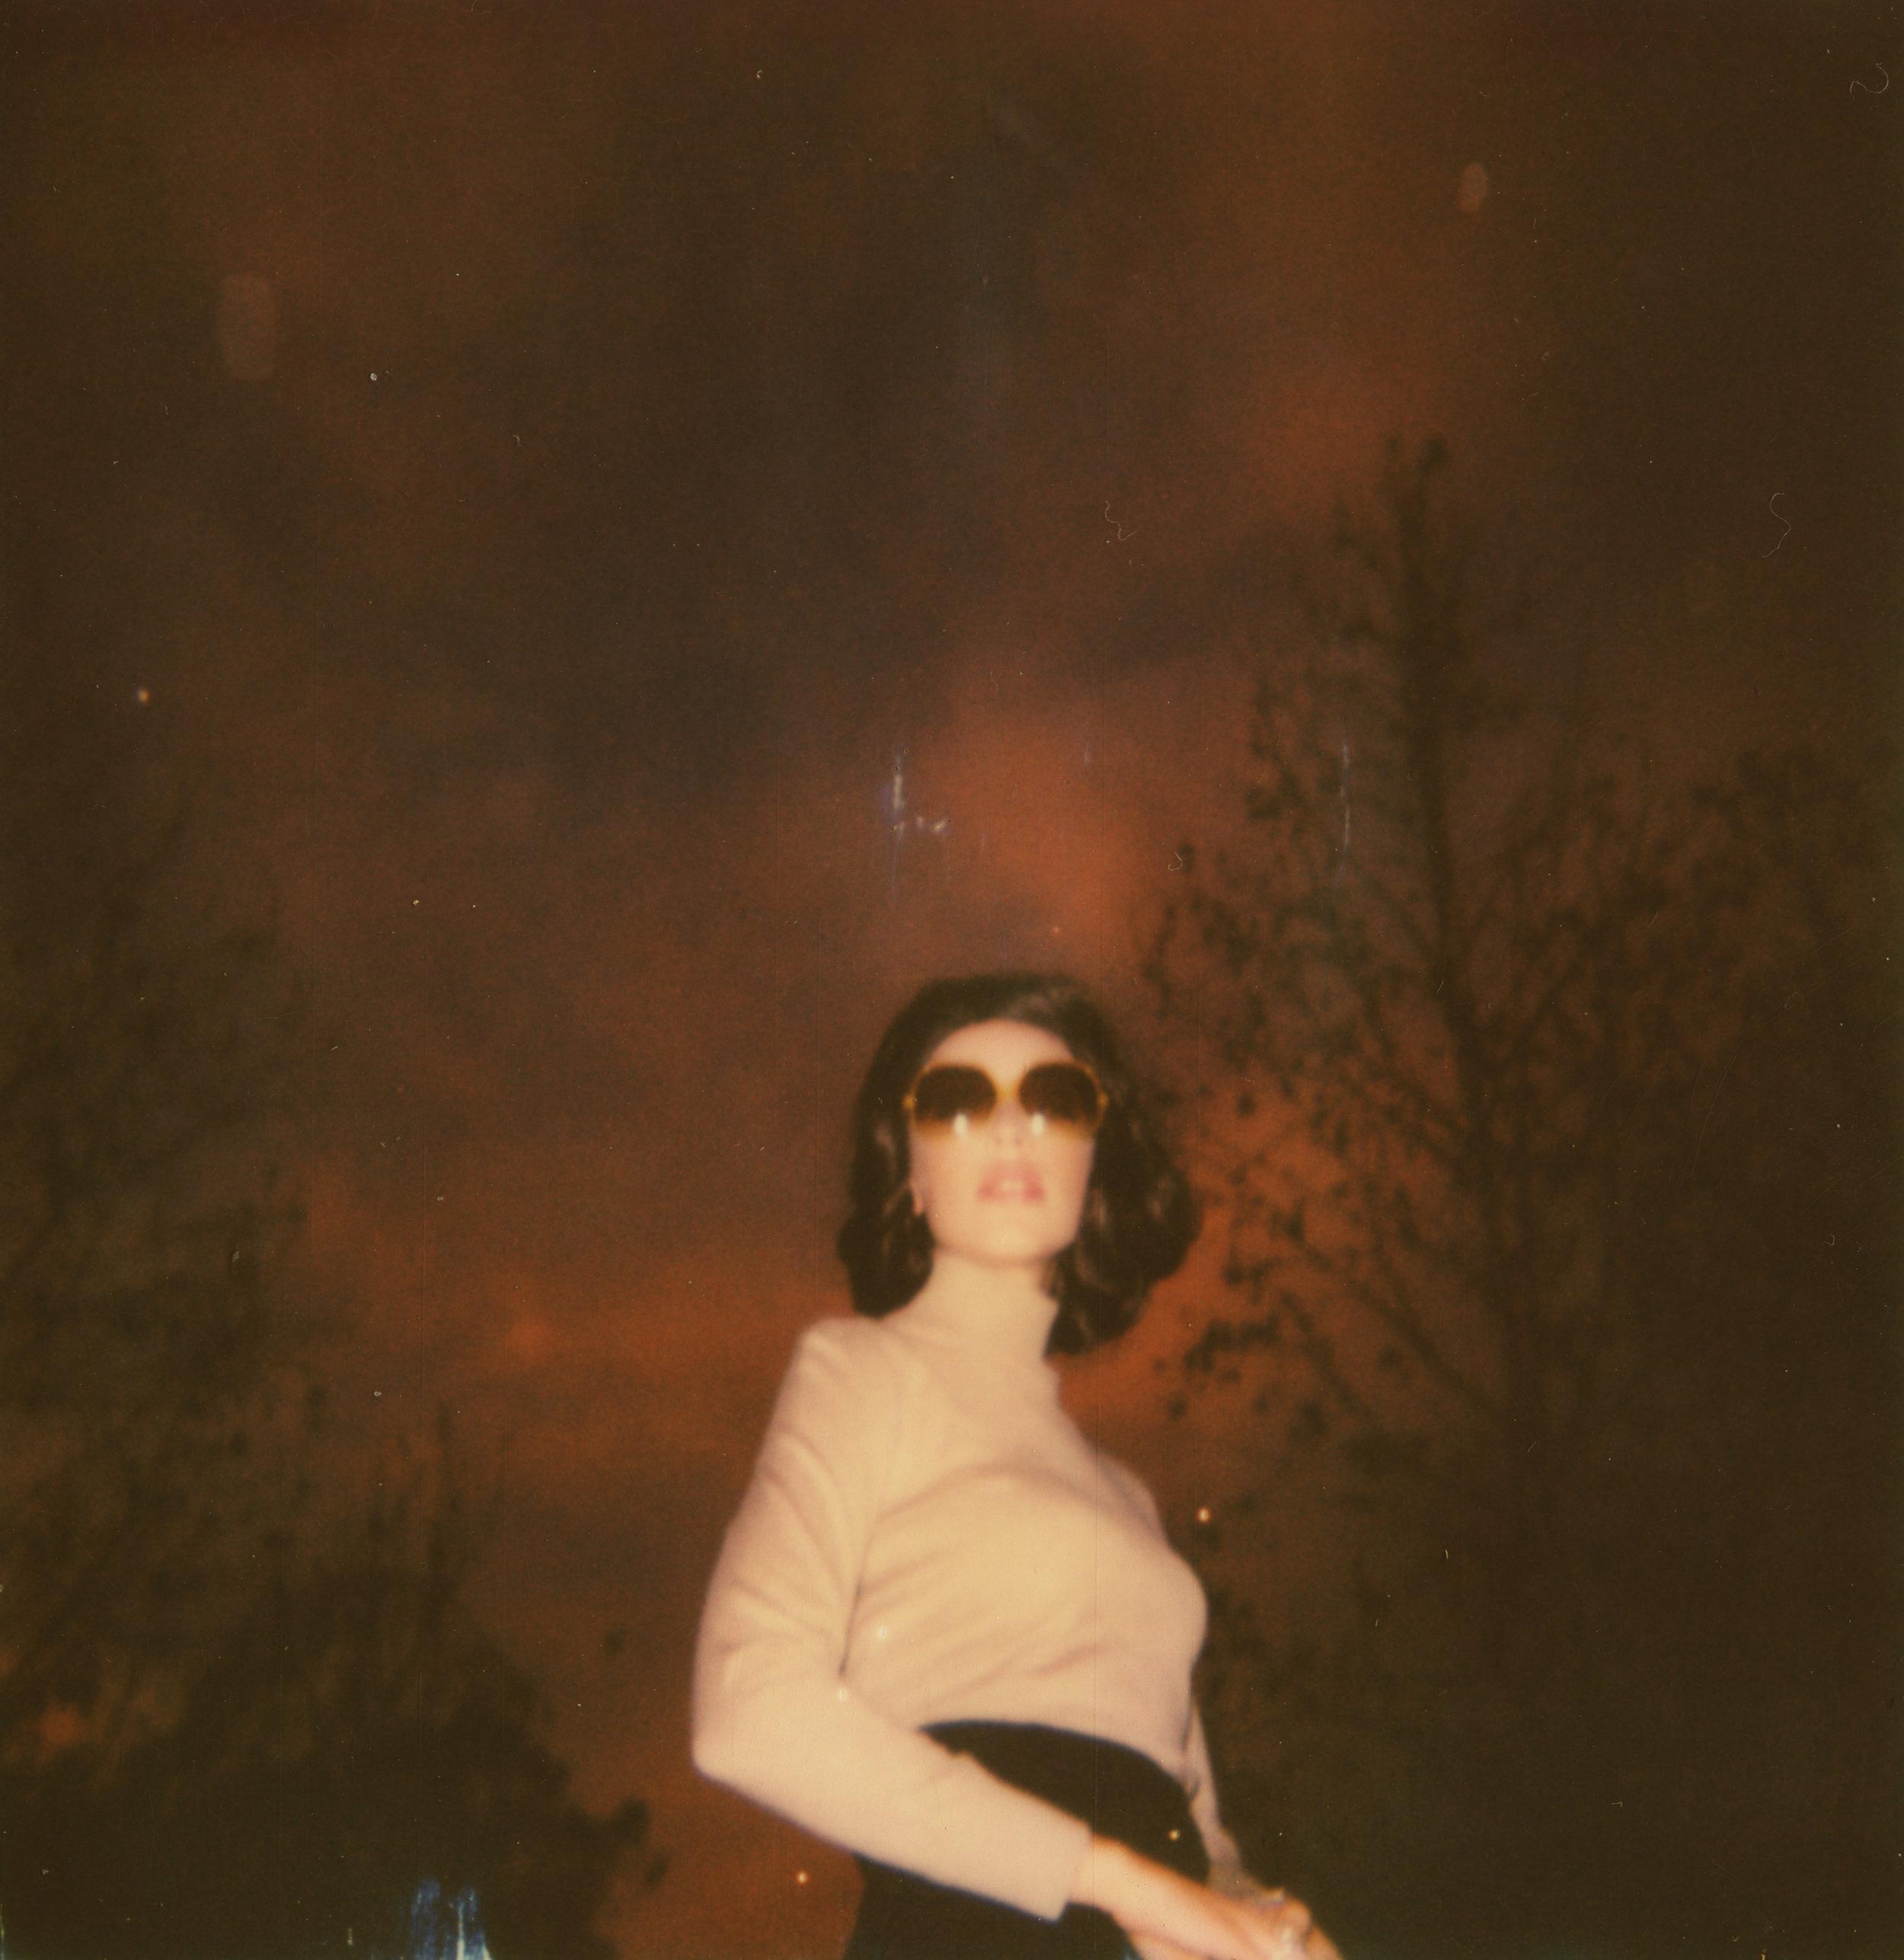 Arlington_PolaroidScan_22.jpg